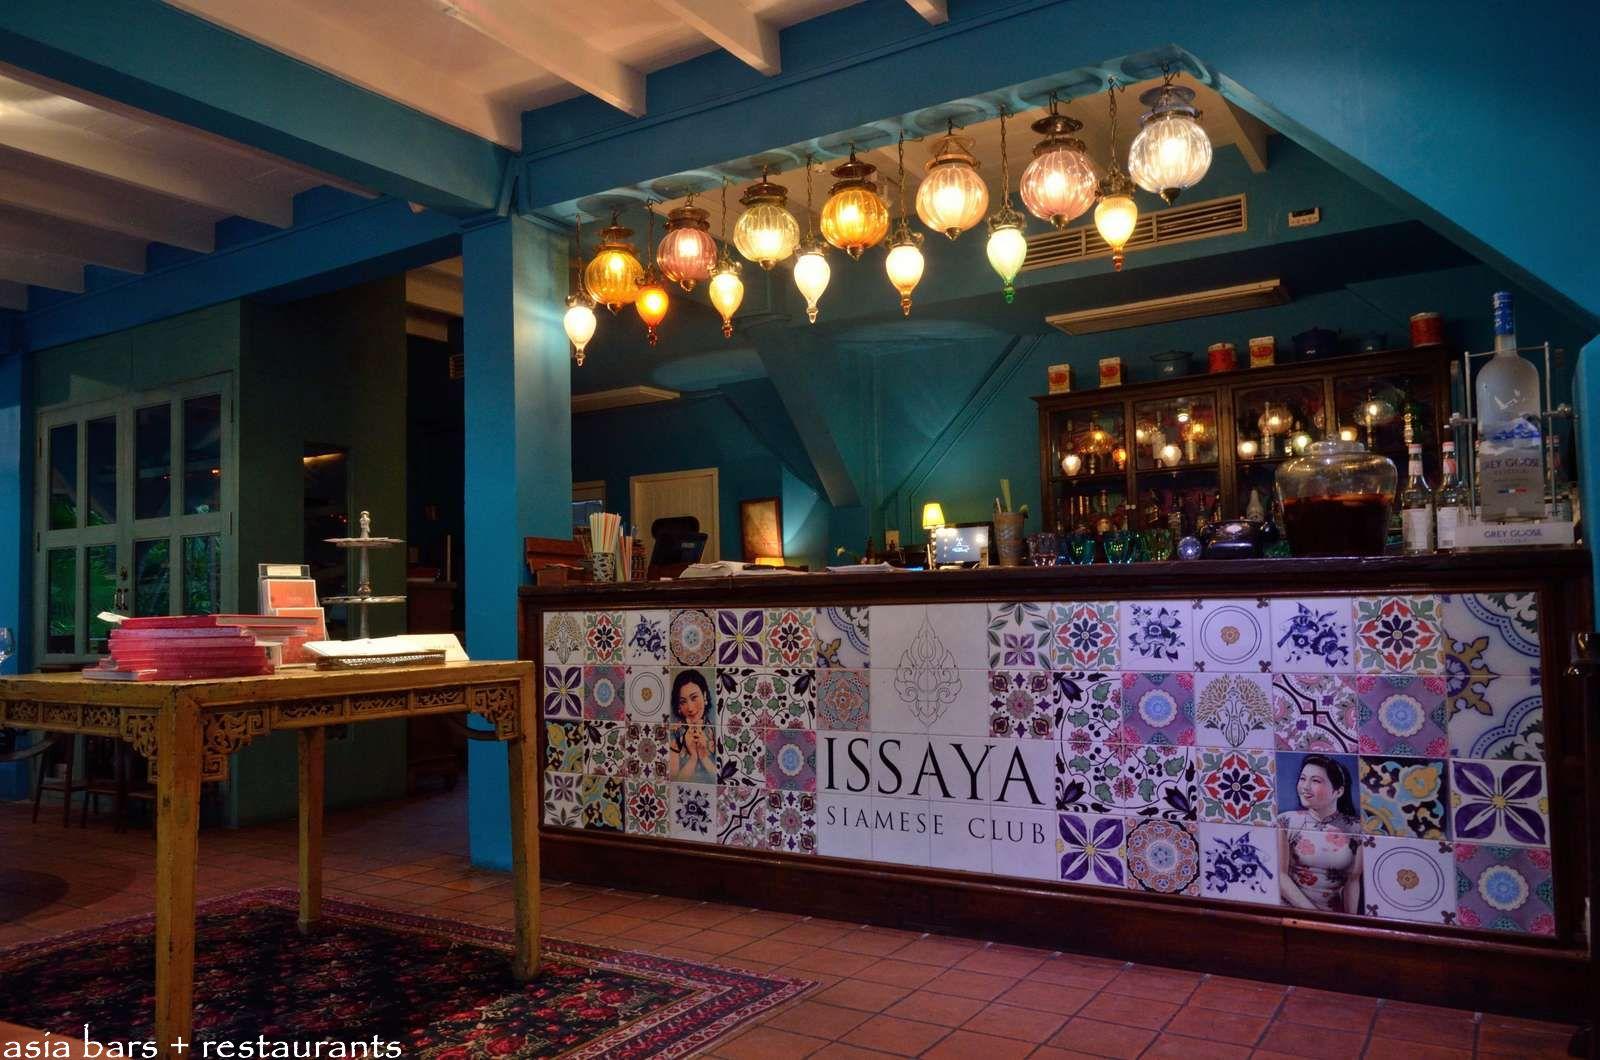 Issaya Siamese Club Modern Thai Restaurant Amp Lounge In